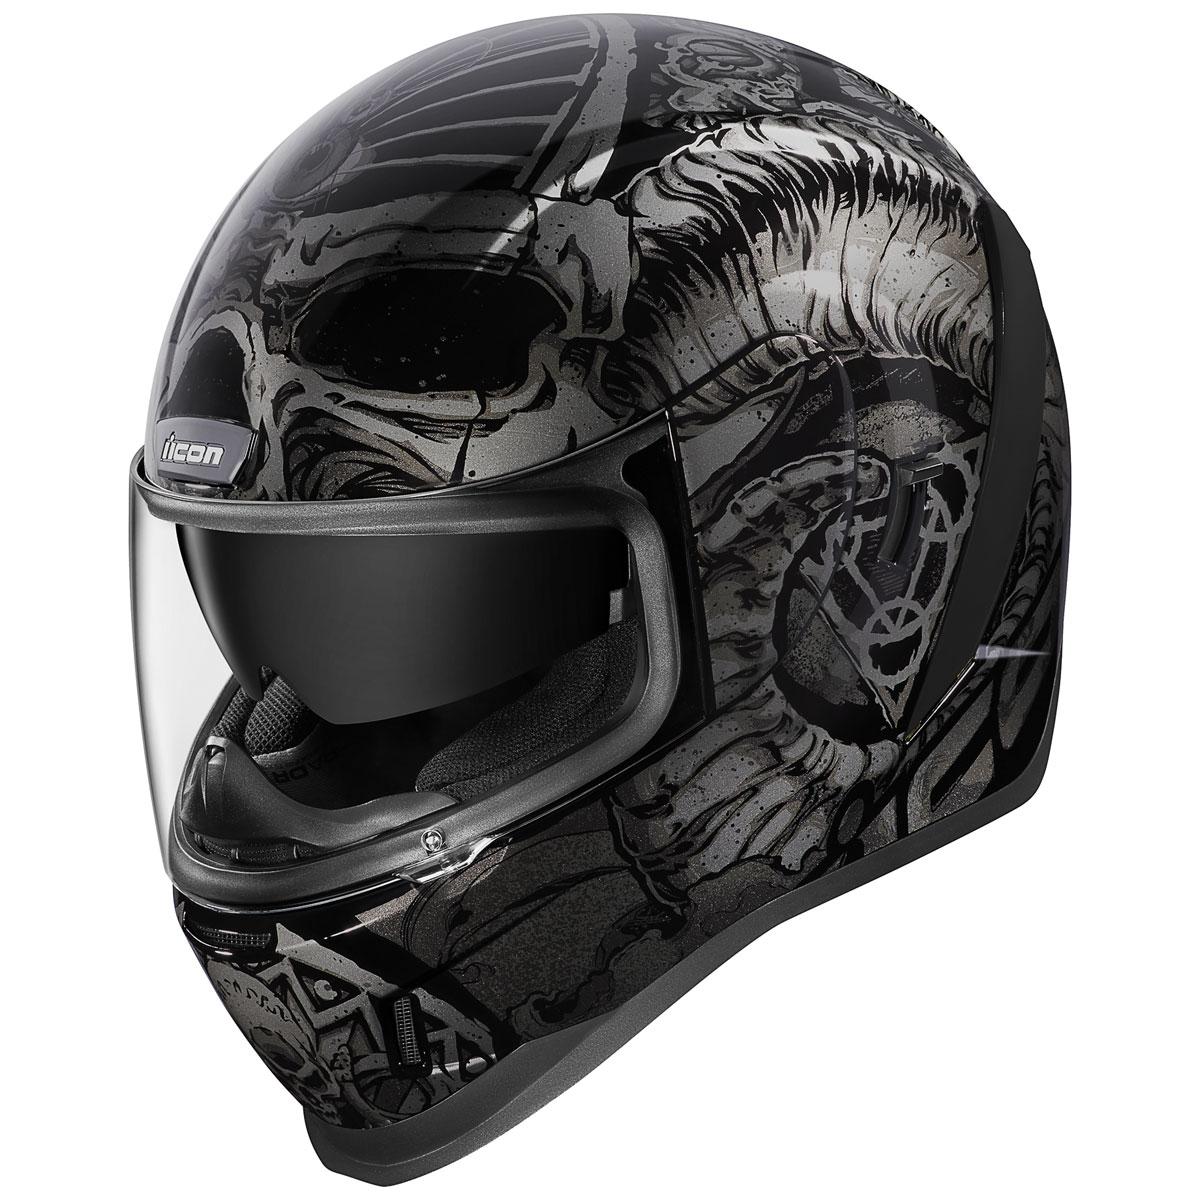 ICON Airform Sacrosanct Black Full Face Helmet